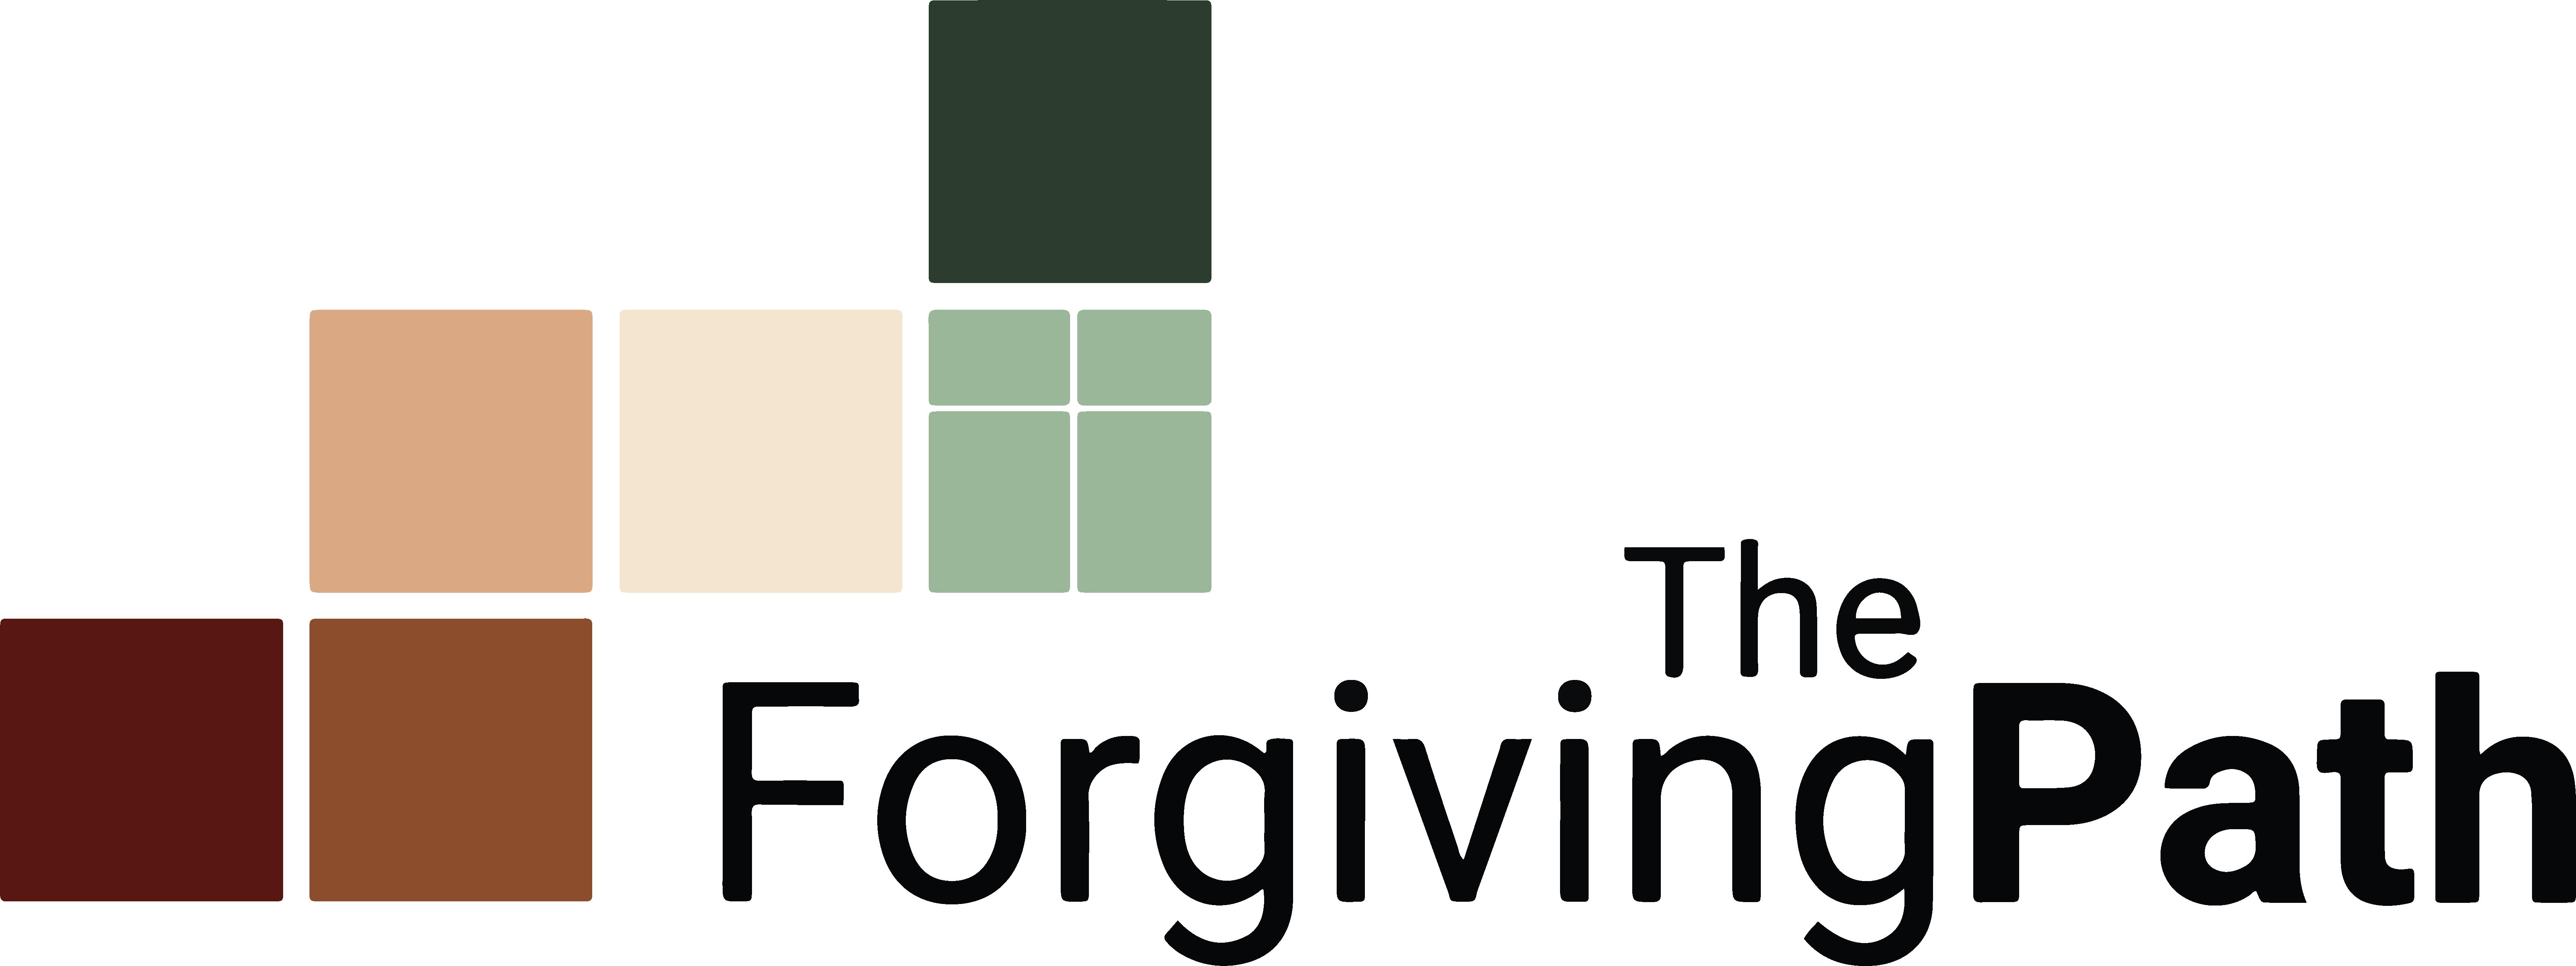 The Forgiving Path